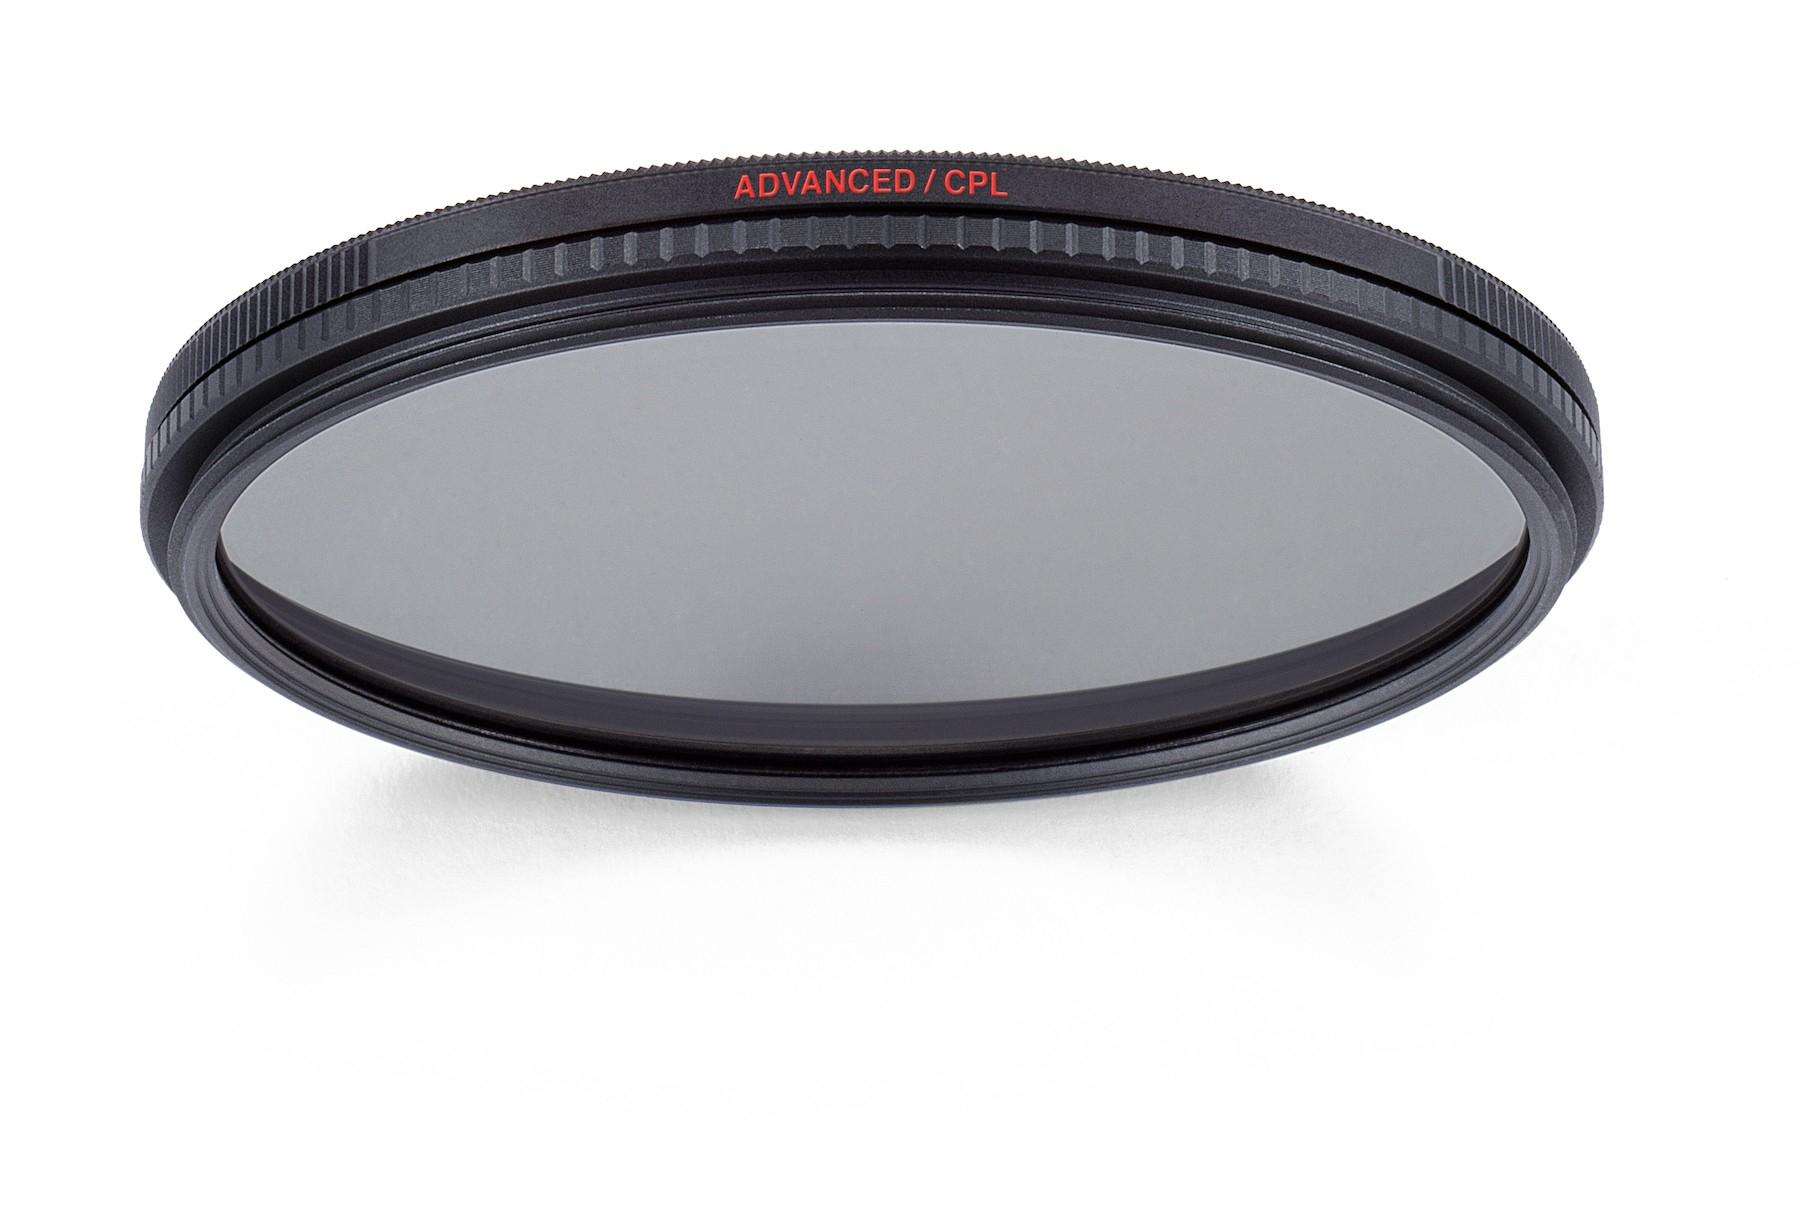 62mm Advanced Circular Polarizing Filter